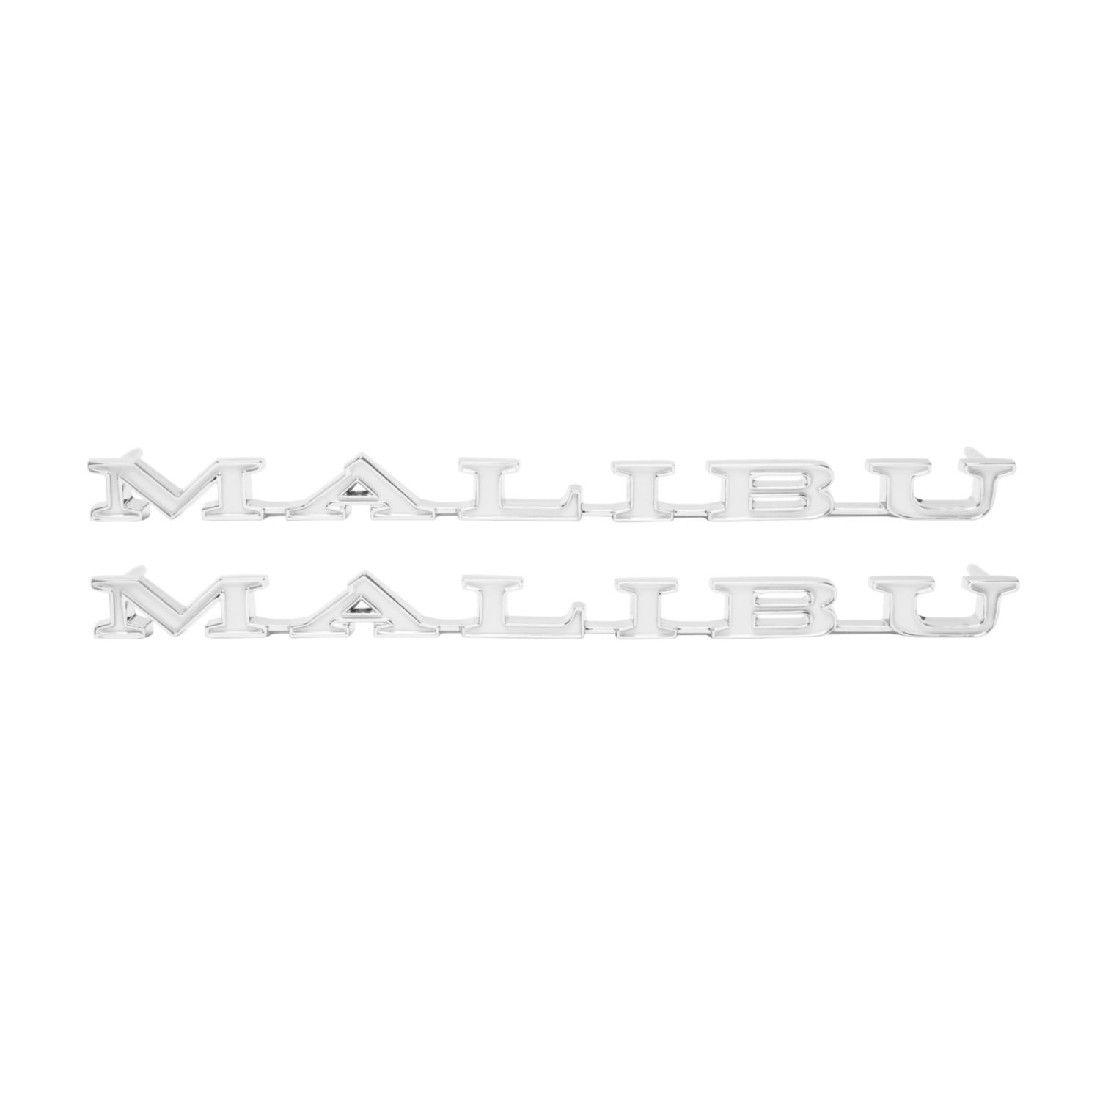 1971-1972 Chevelle Malibu El Camino 350 Grille Emblem EA